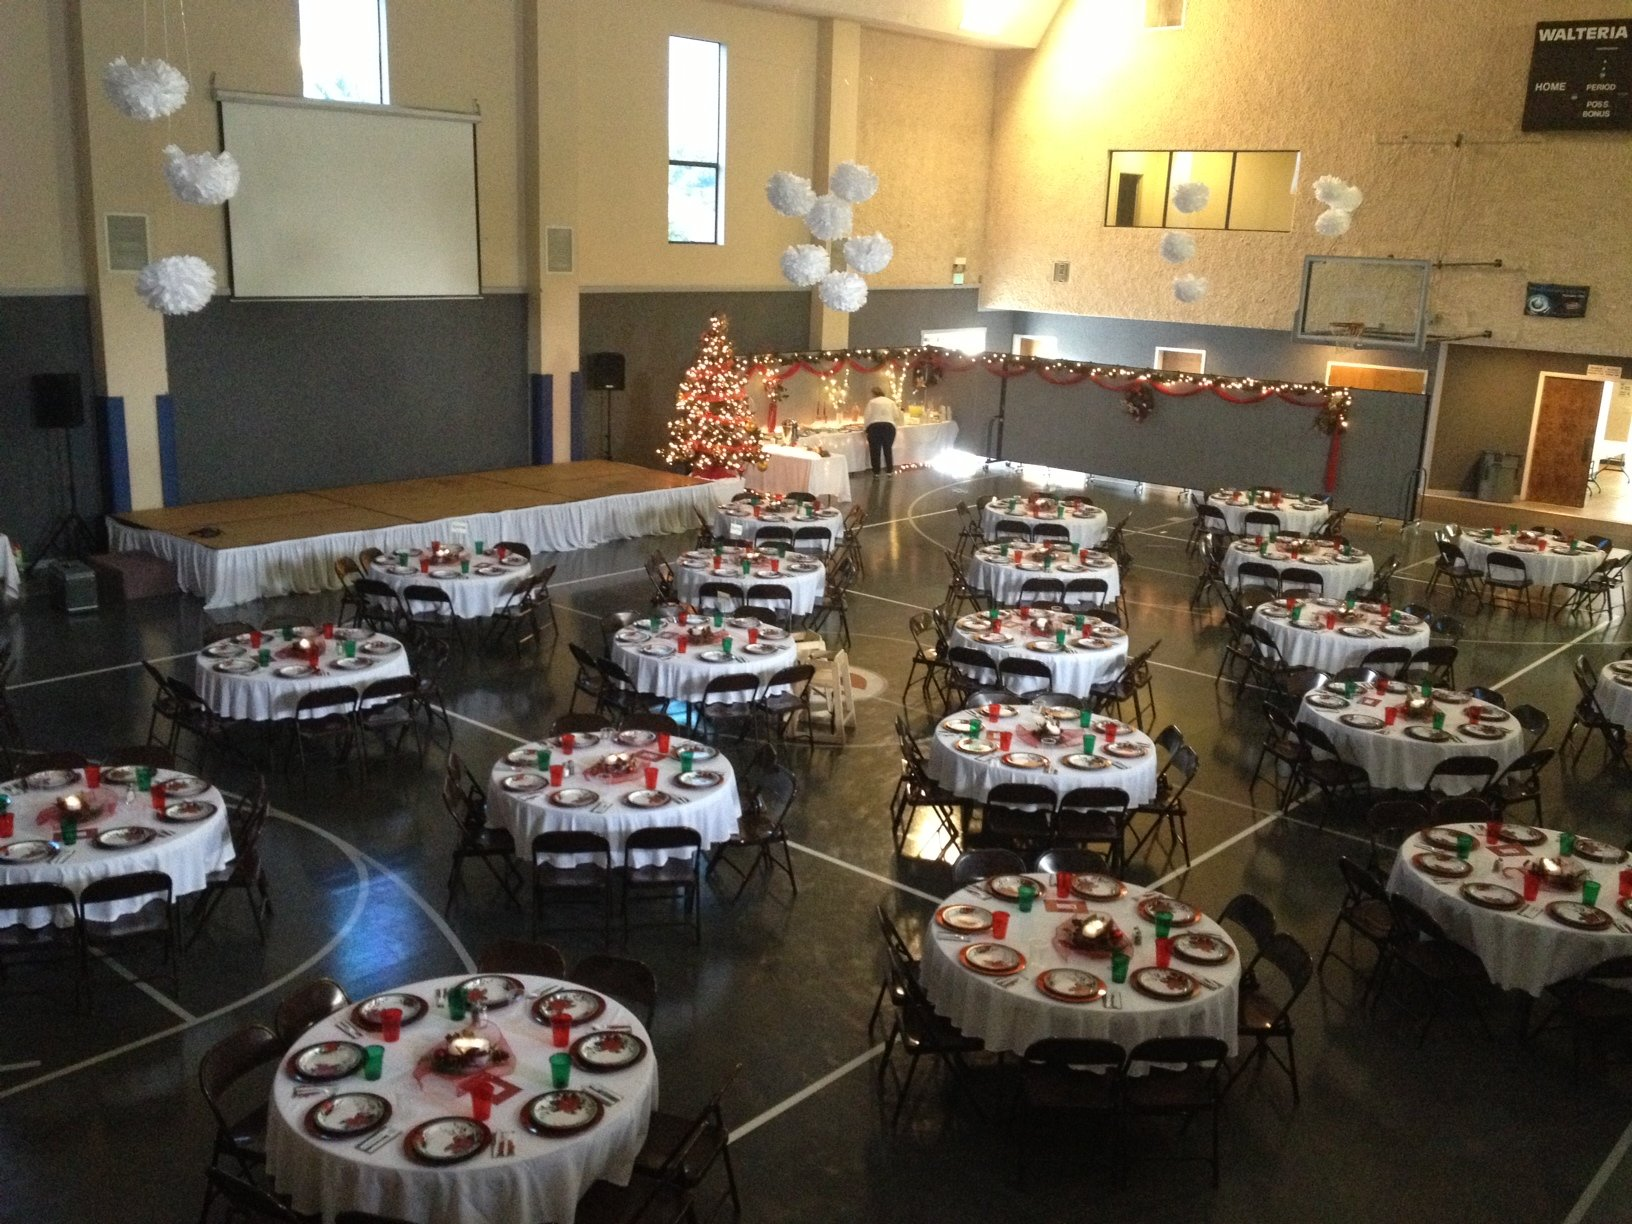 Women's Christmas banquet in a church gym